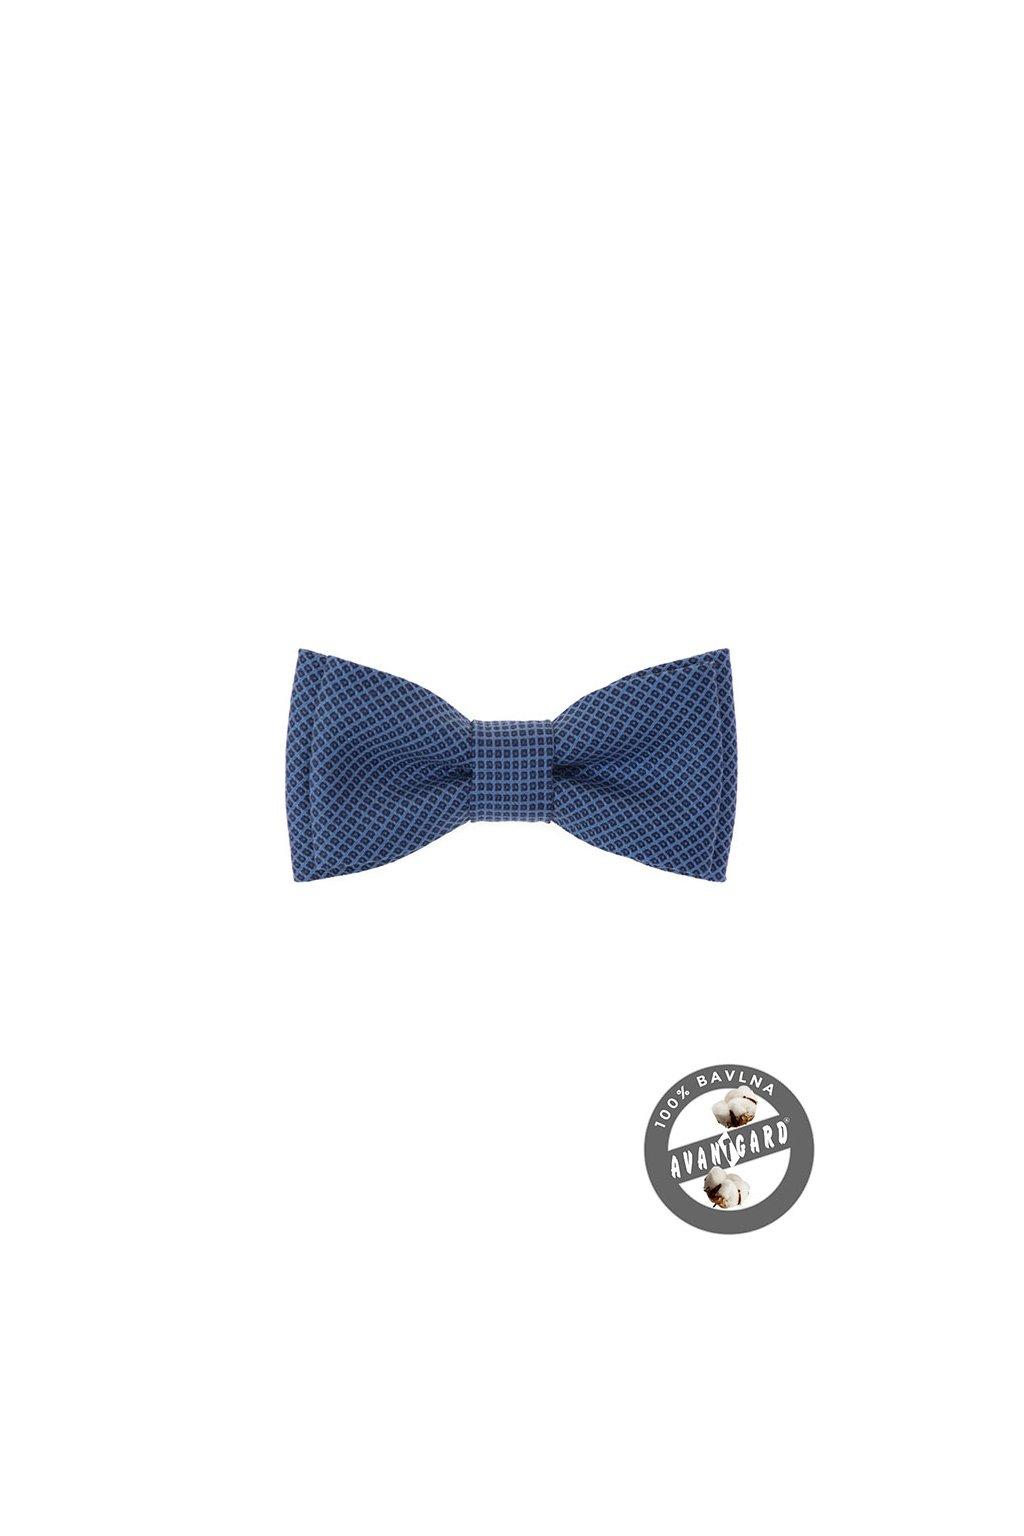 Motýlek MINI bavlněný modrá 531 - 51010